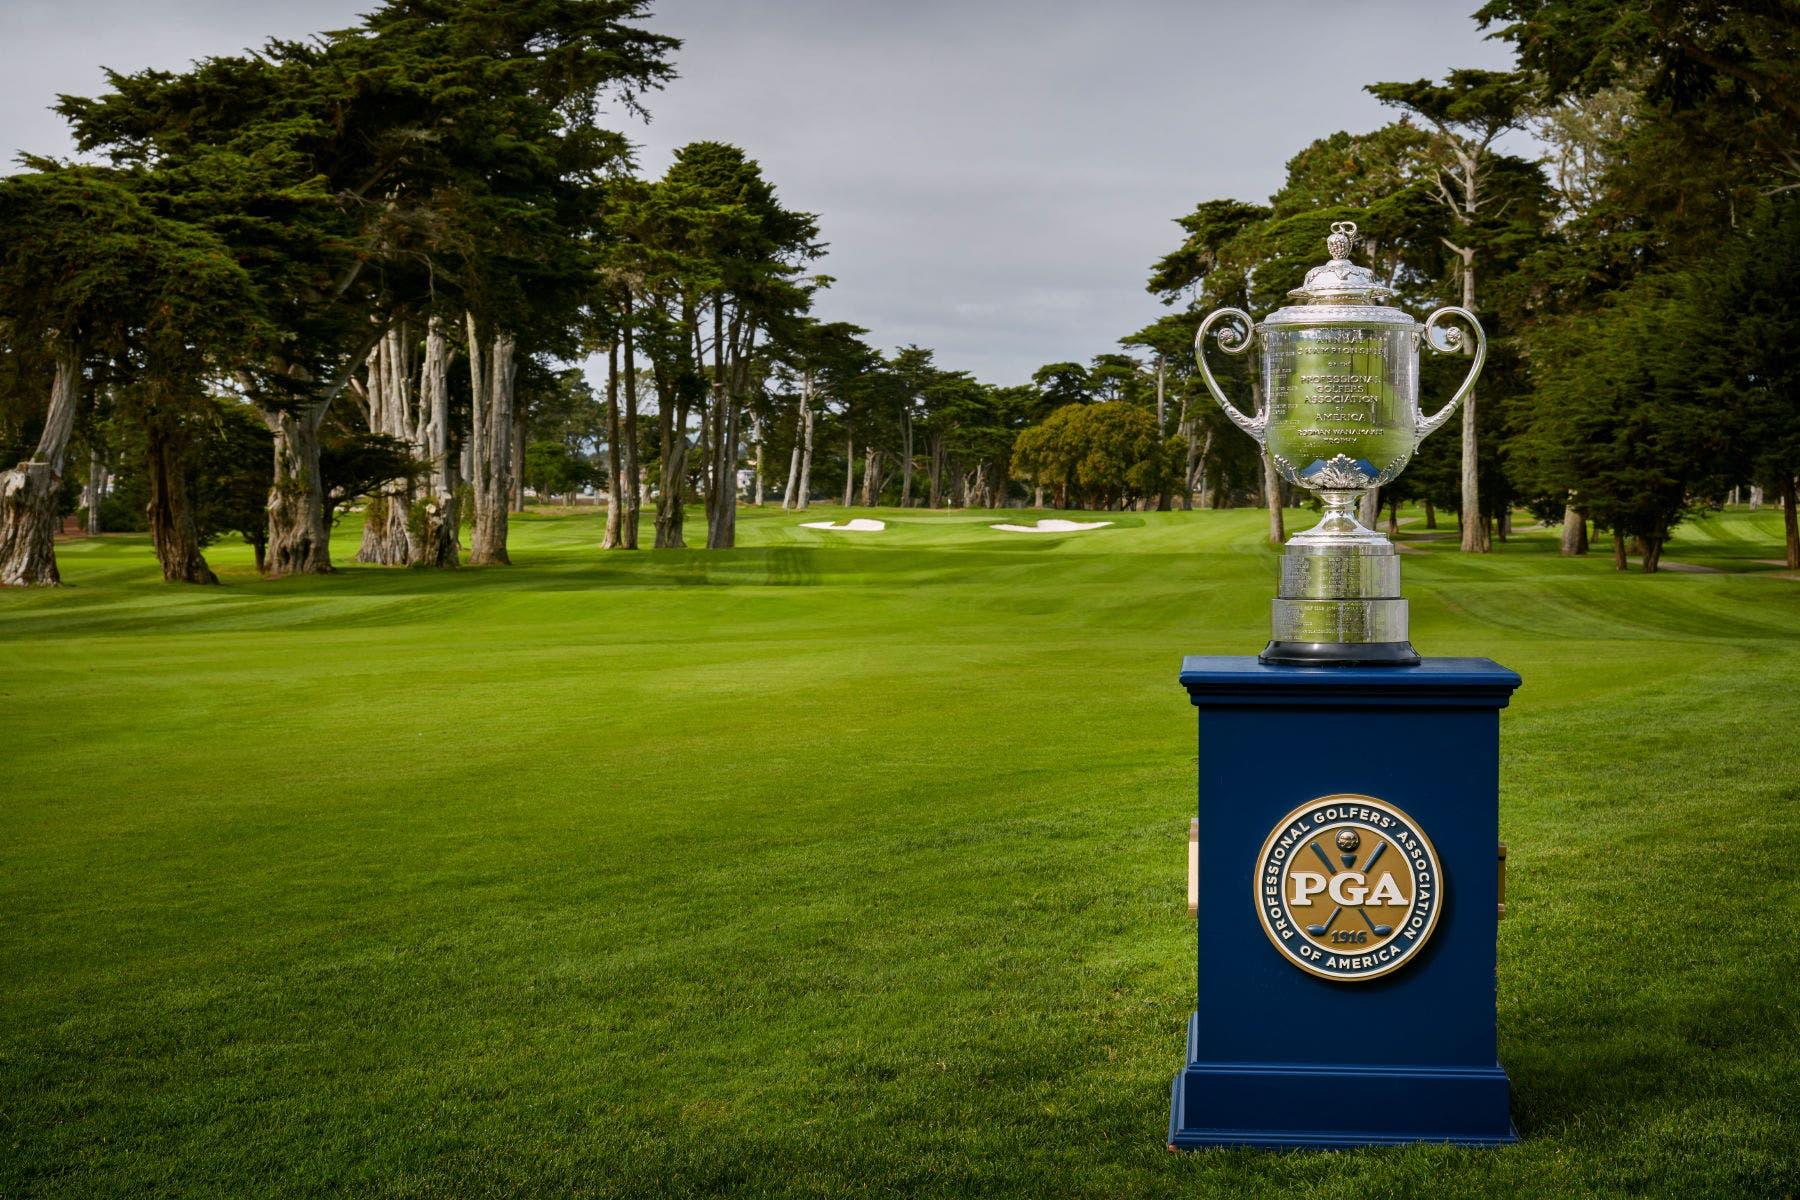 PGA iniciará con o sin presencia de fanáticos